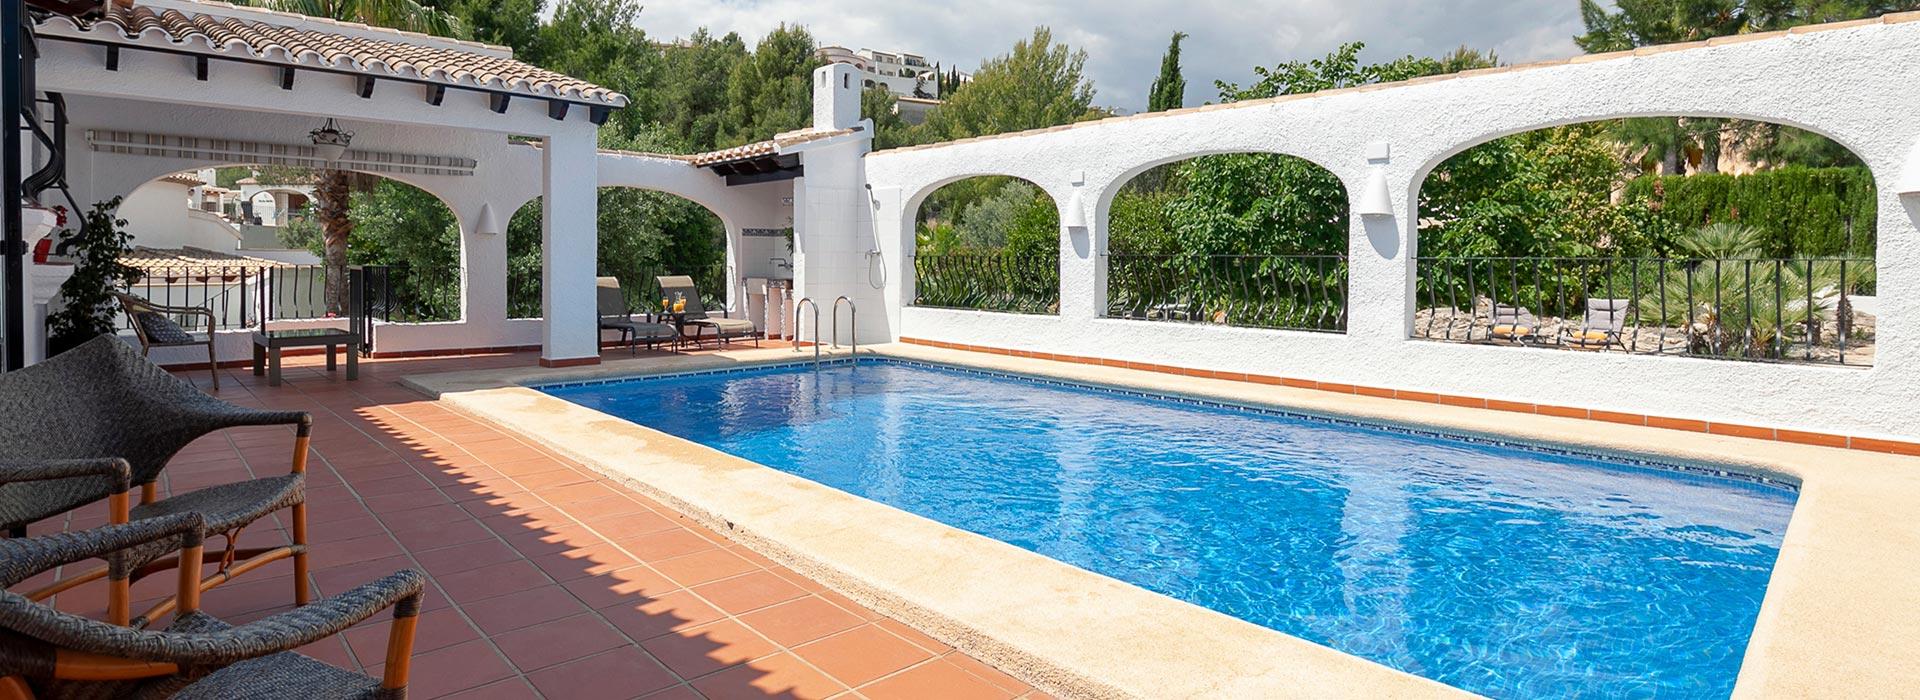 acb.immo - Villa de 5 chambres avec vue mer à Monte Pego, Denia